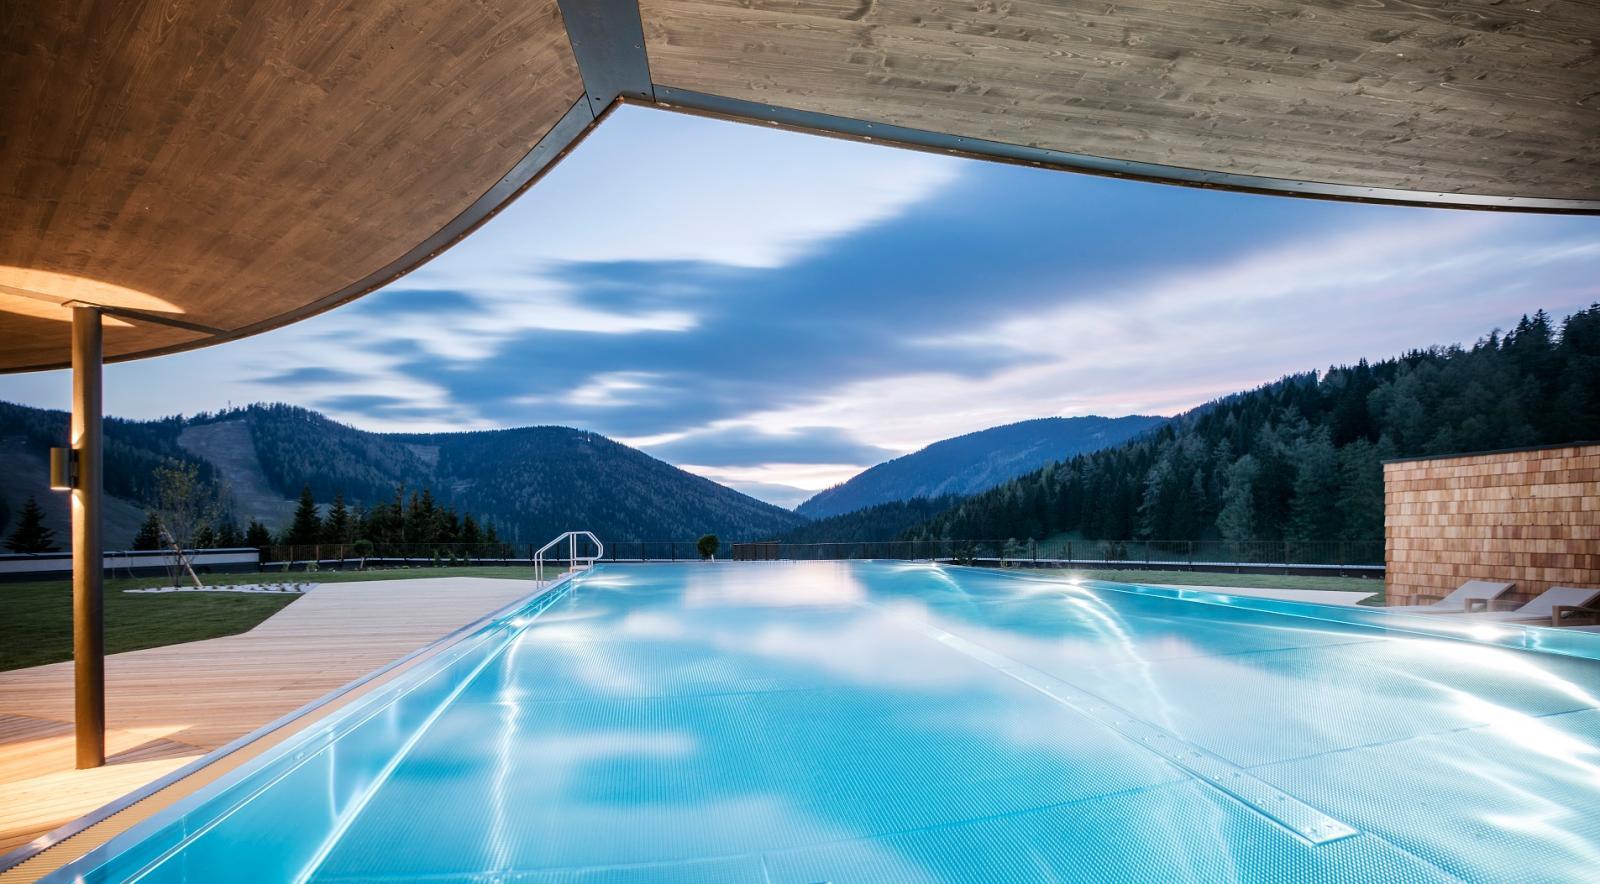 Autogenes Training: Foto vom Wellnesshotel Almwellness Hotel Pierer ****Superior | Wellness Steiermark